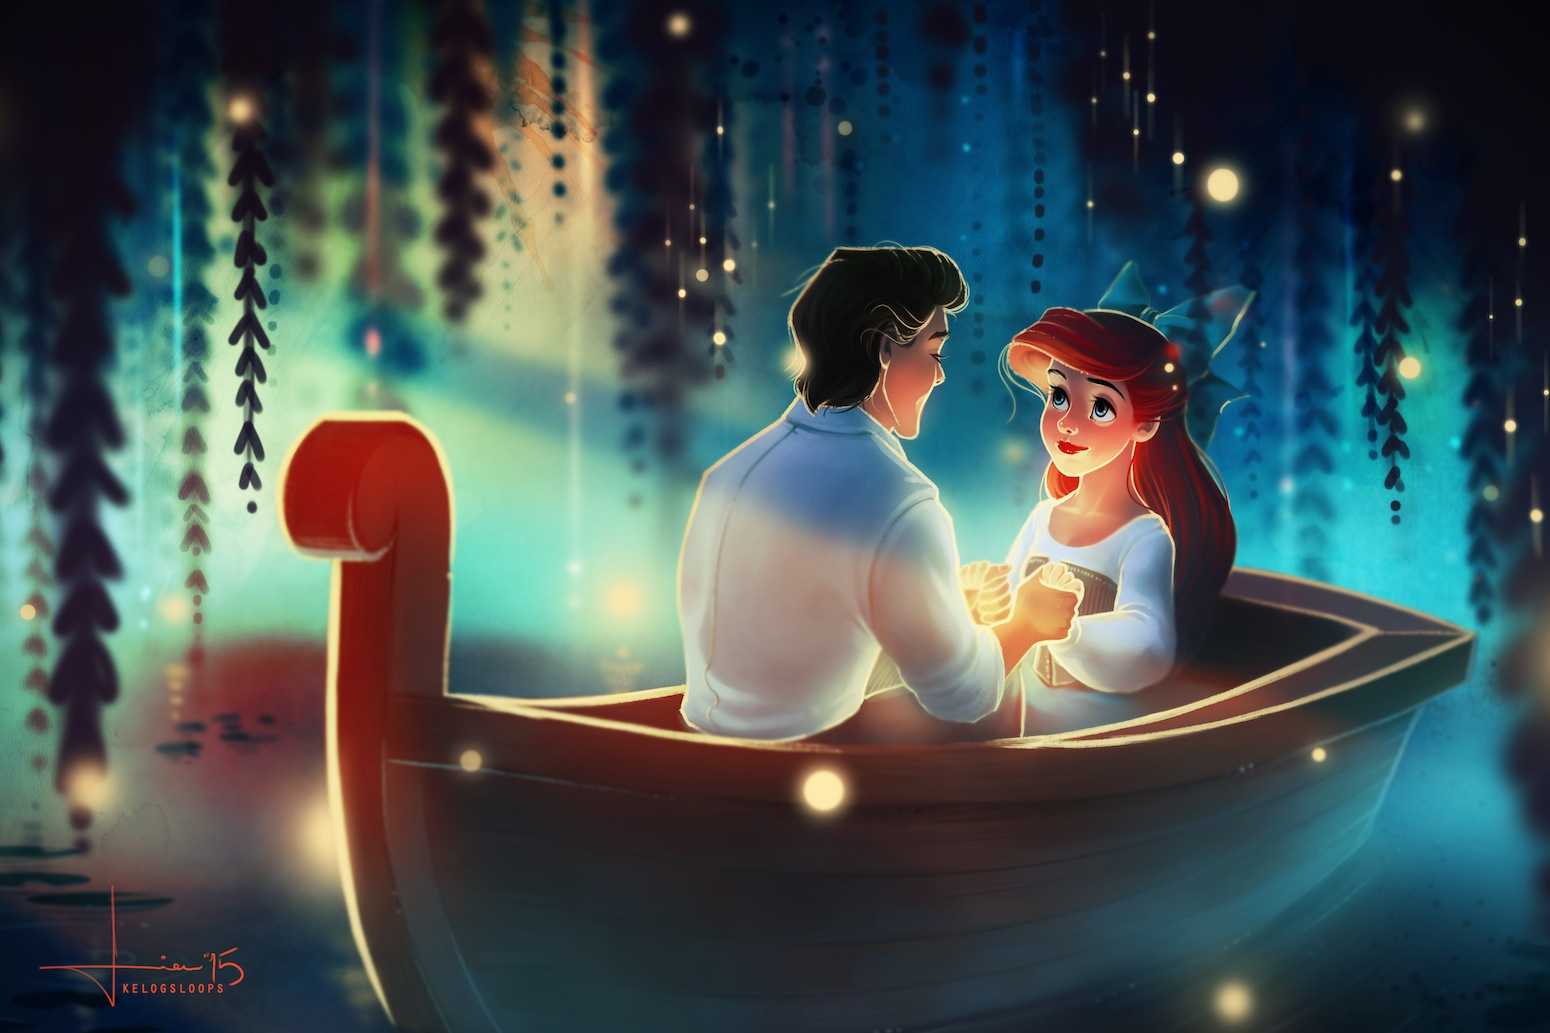 Artist Captures Disneys Most Romantic Scenes The Gce